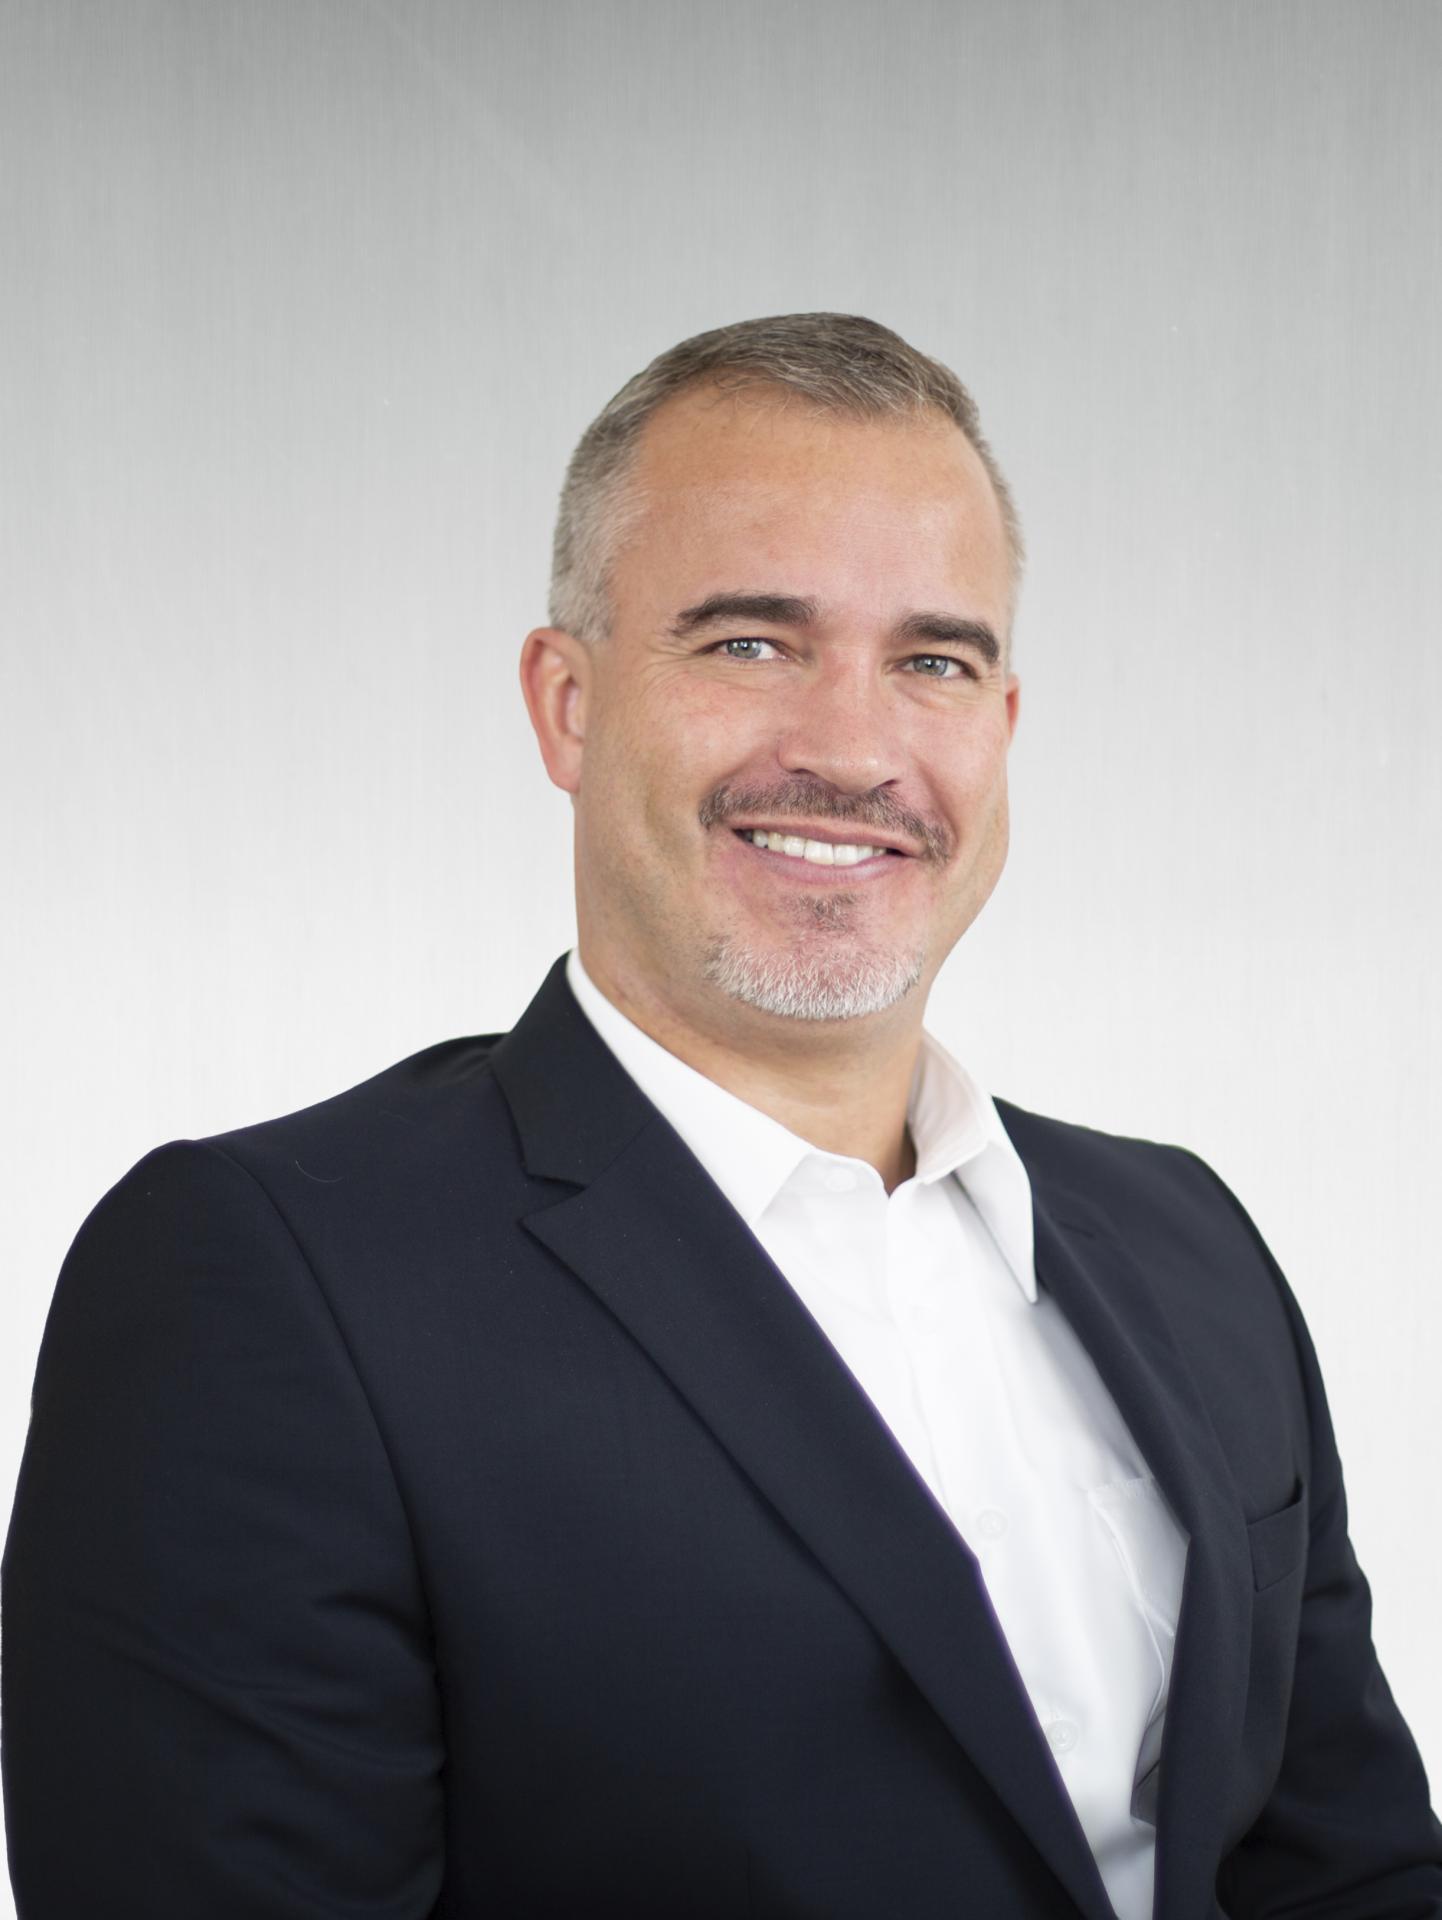 1. Bürgermeister Michael Herzog